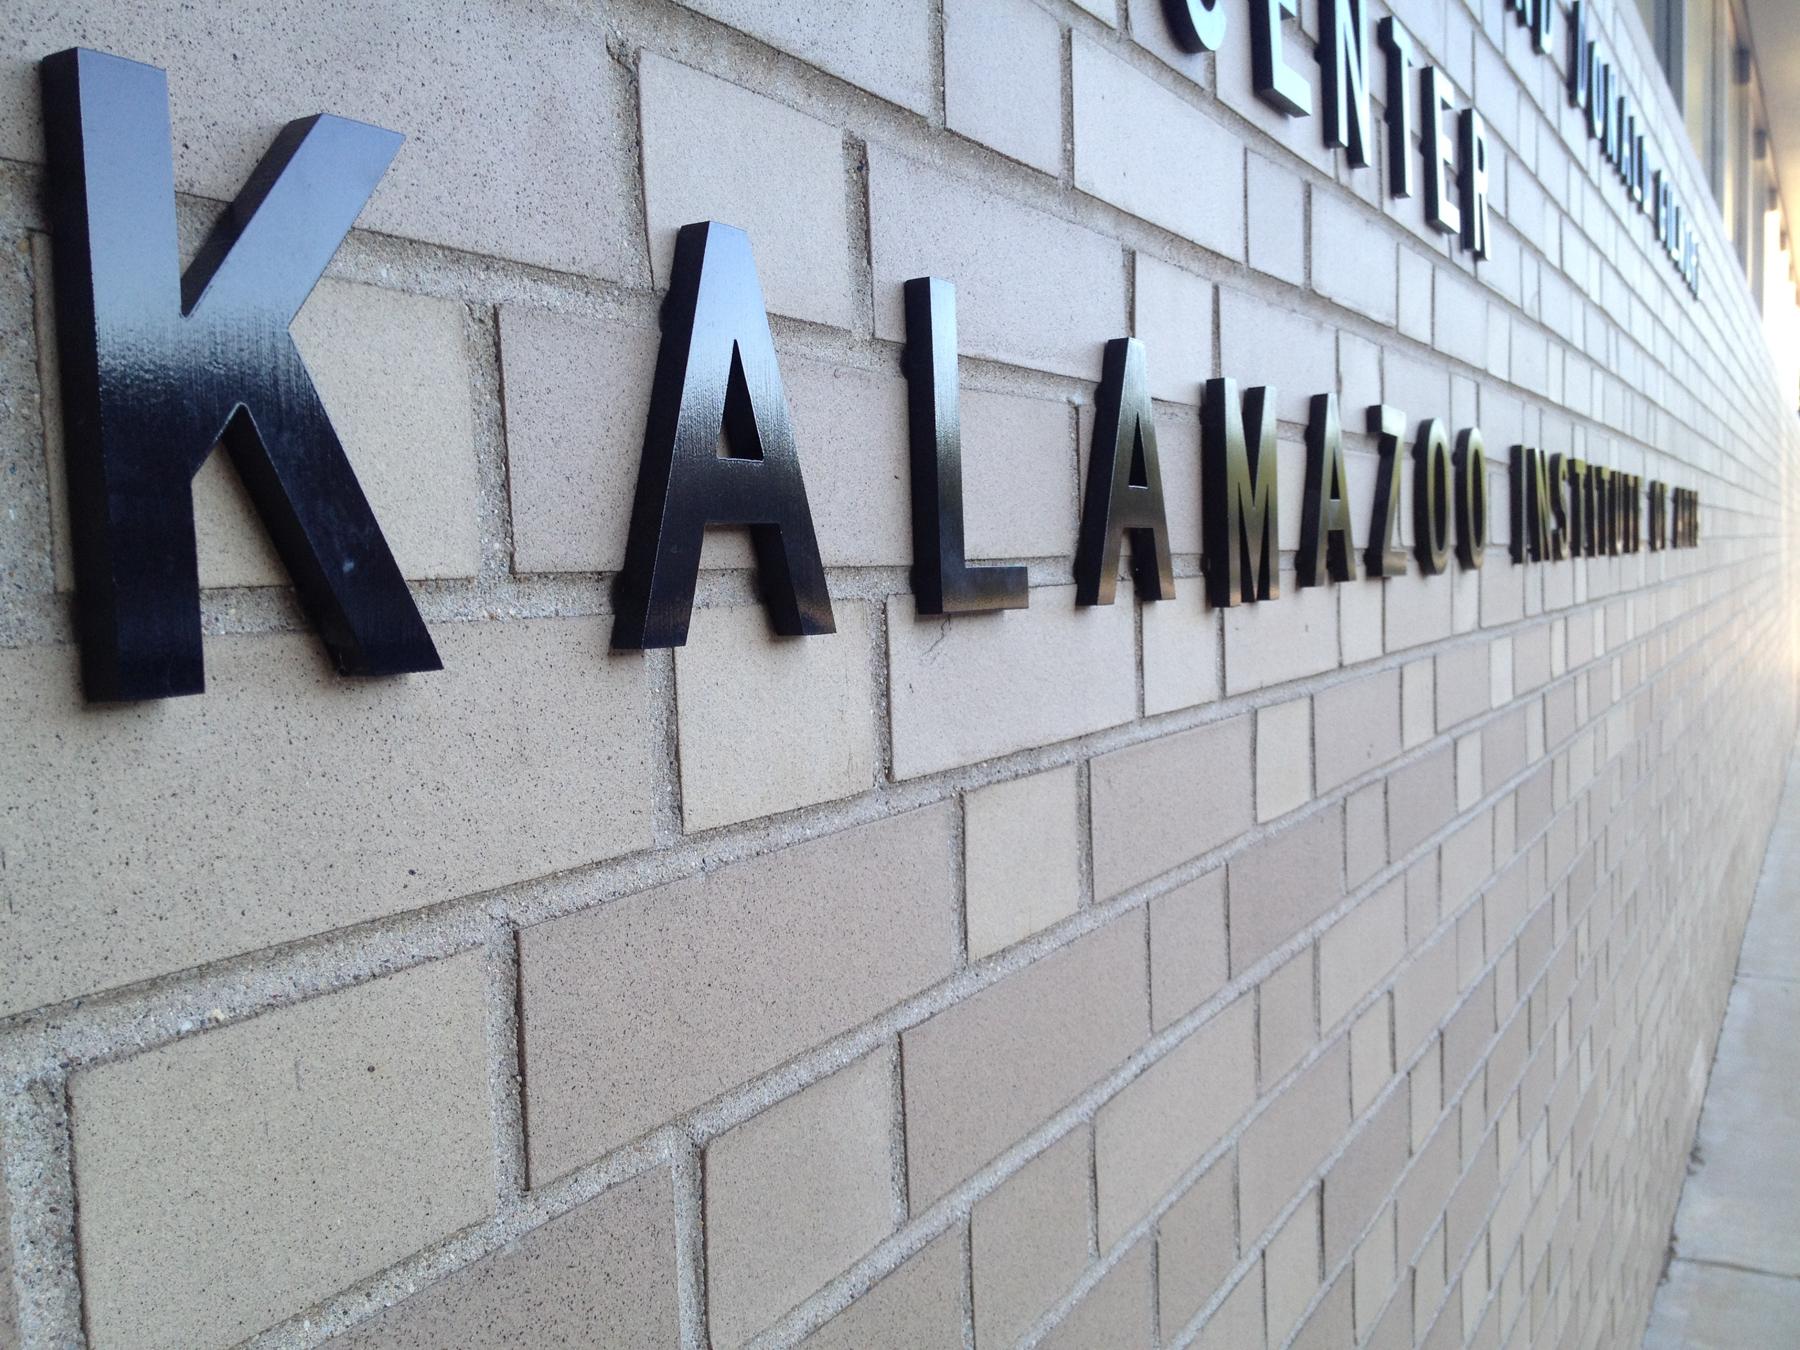 Kalamazoo Art Institute